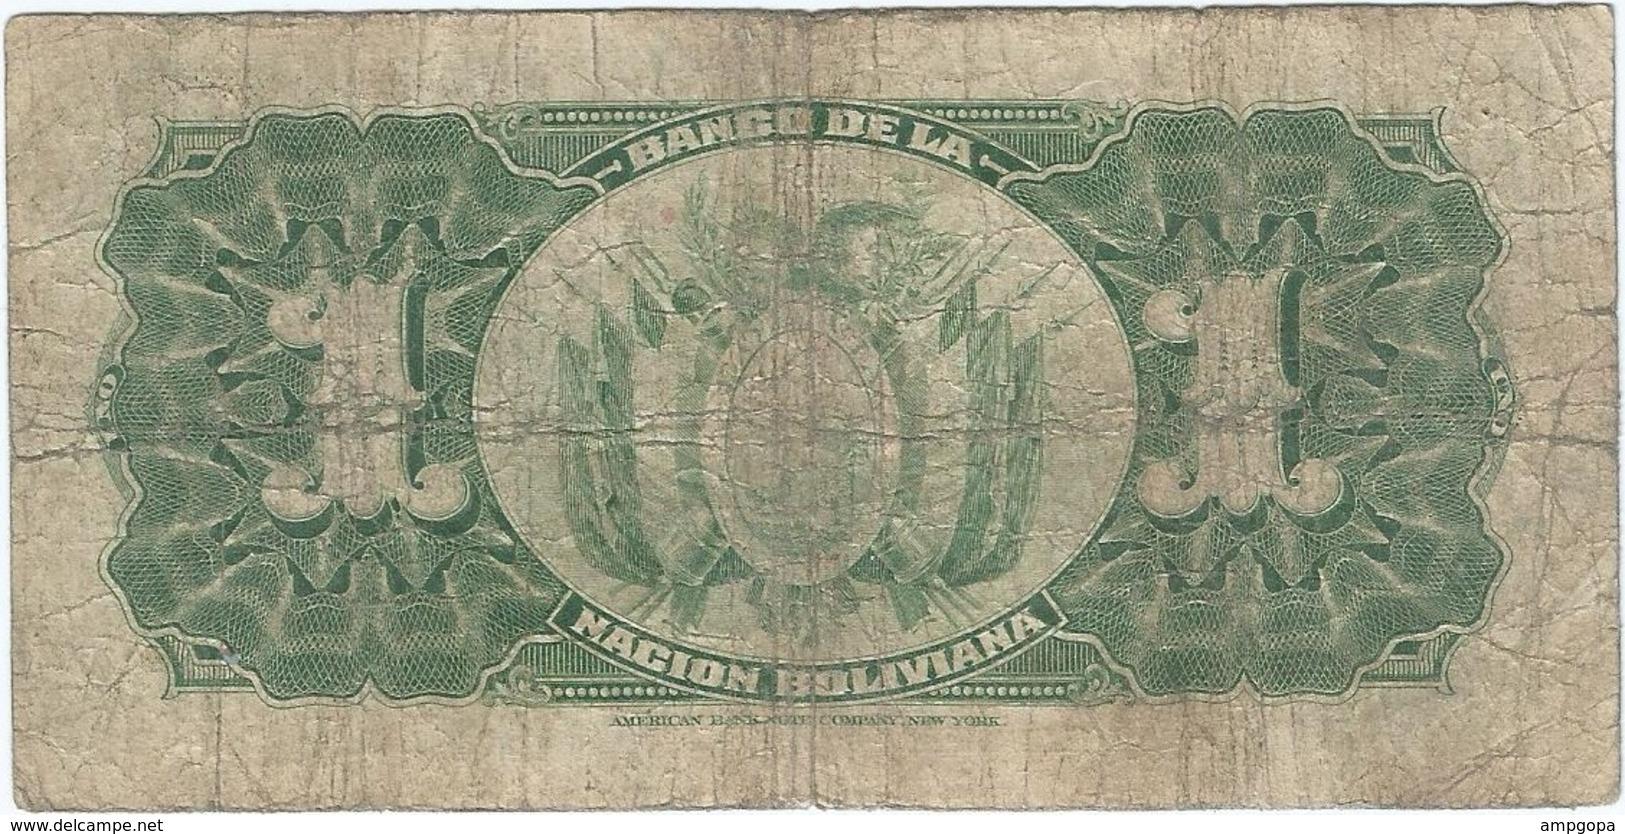 Bolivia 1 Boliviano 11-05-1911 (1929) Pick 112.3 Ref 1686 - Bolivia